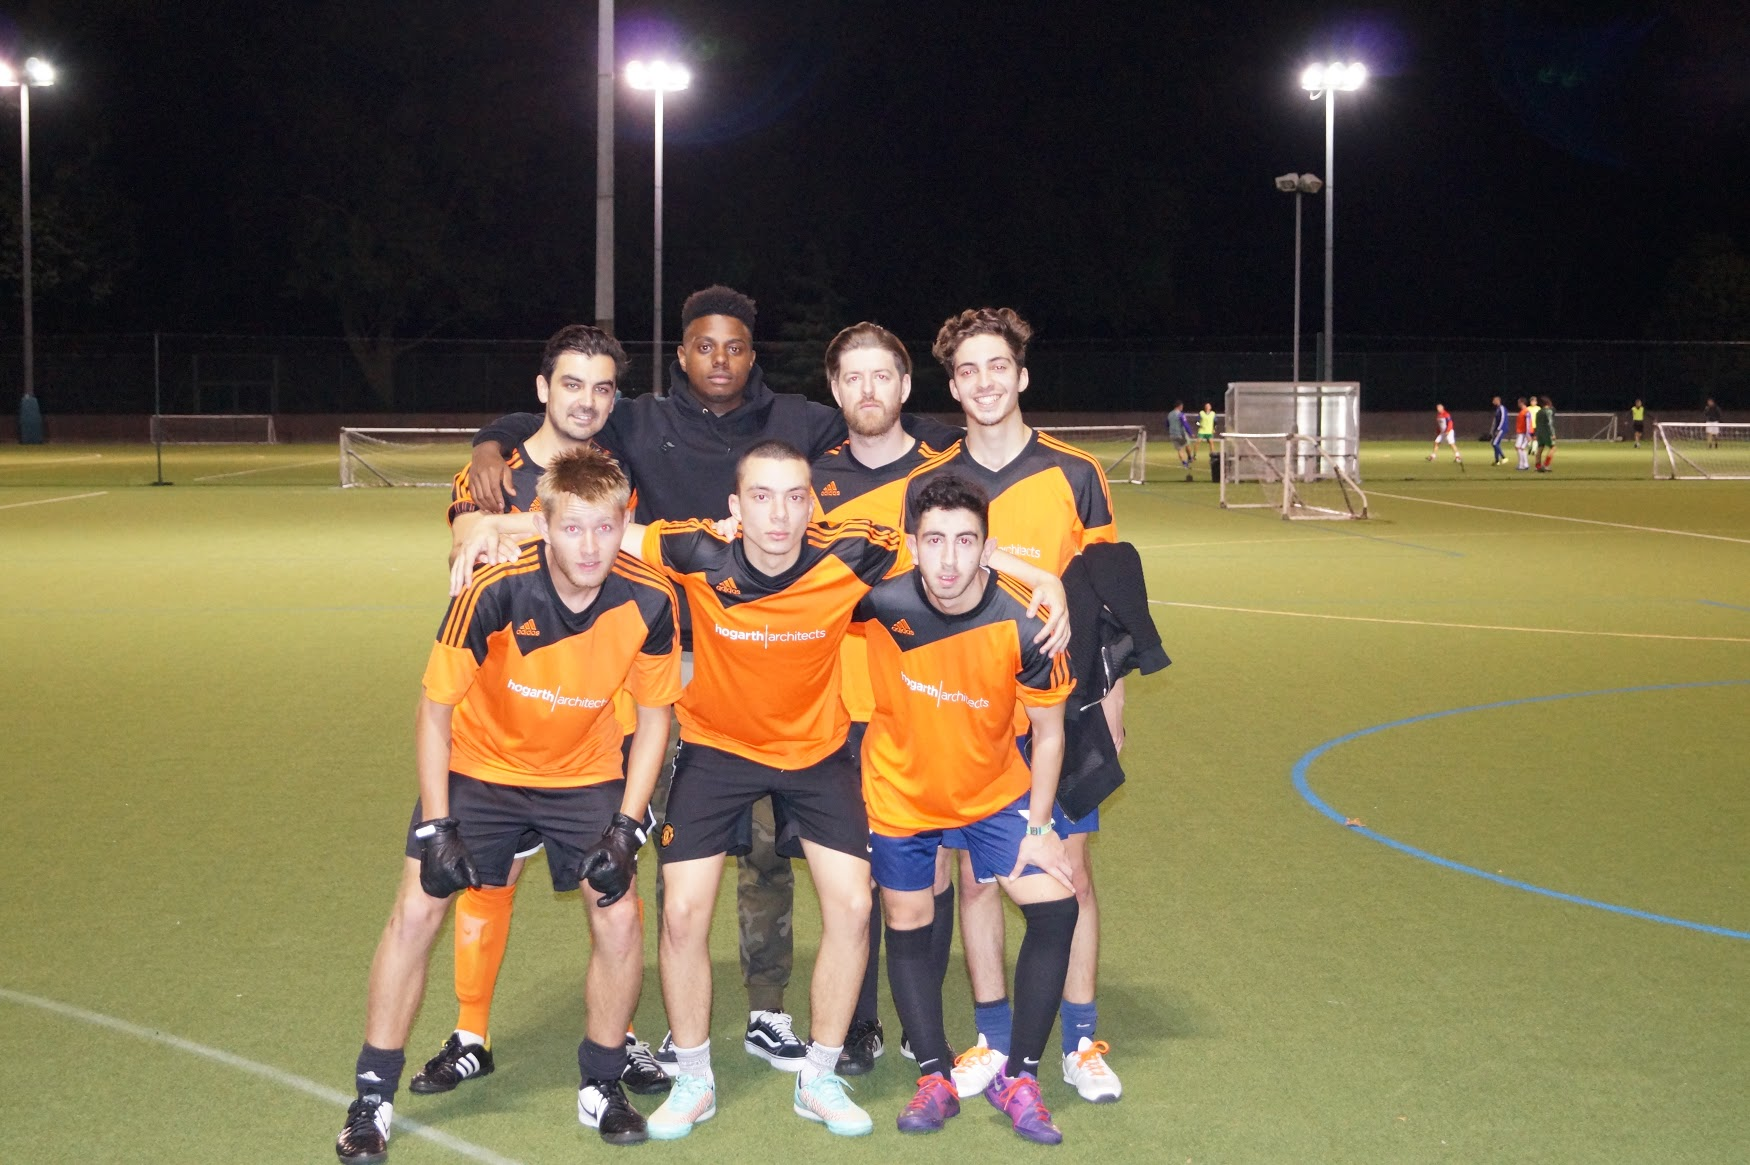 Hogarth Tournament Team2.JPG